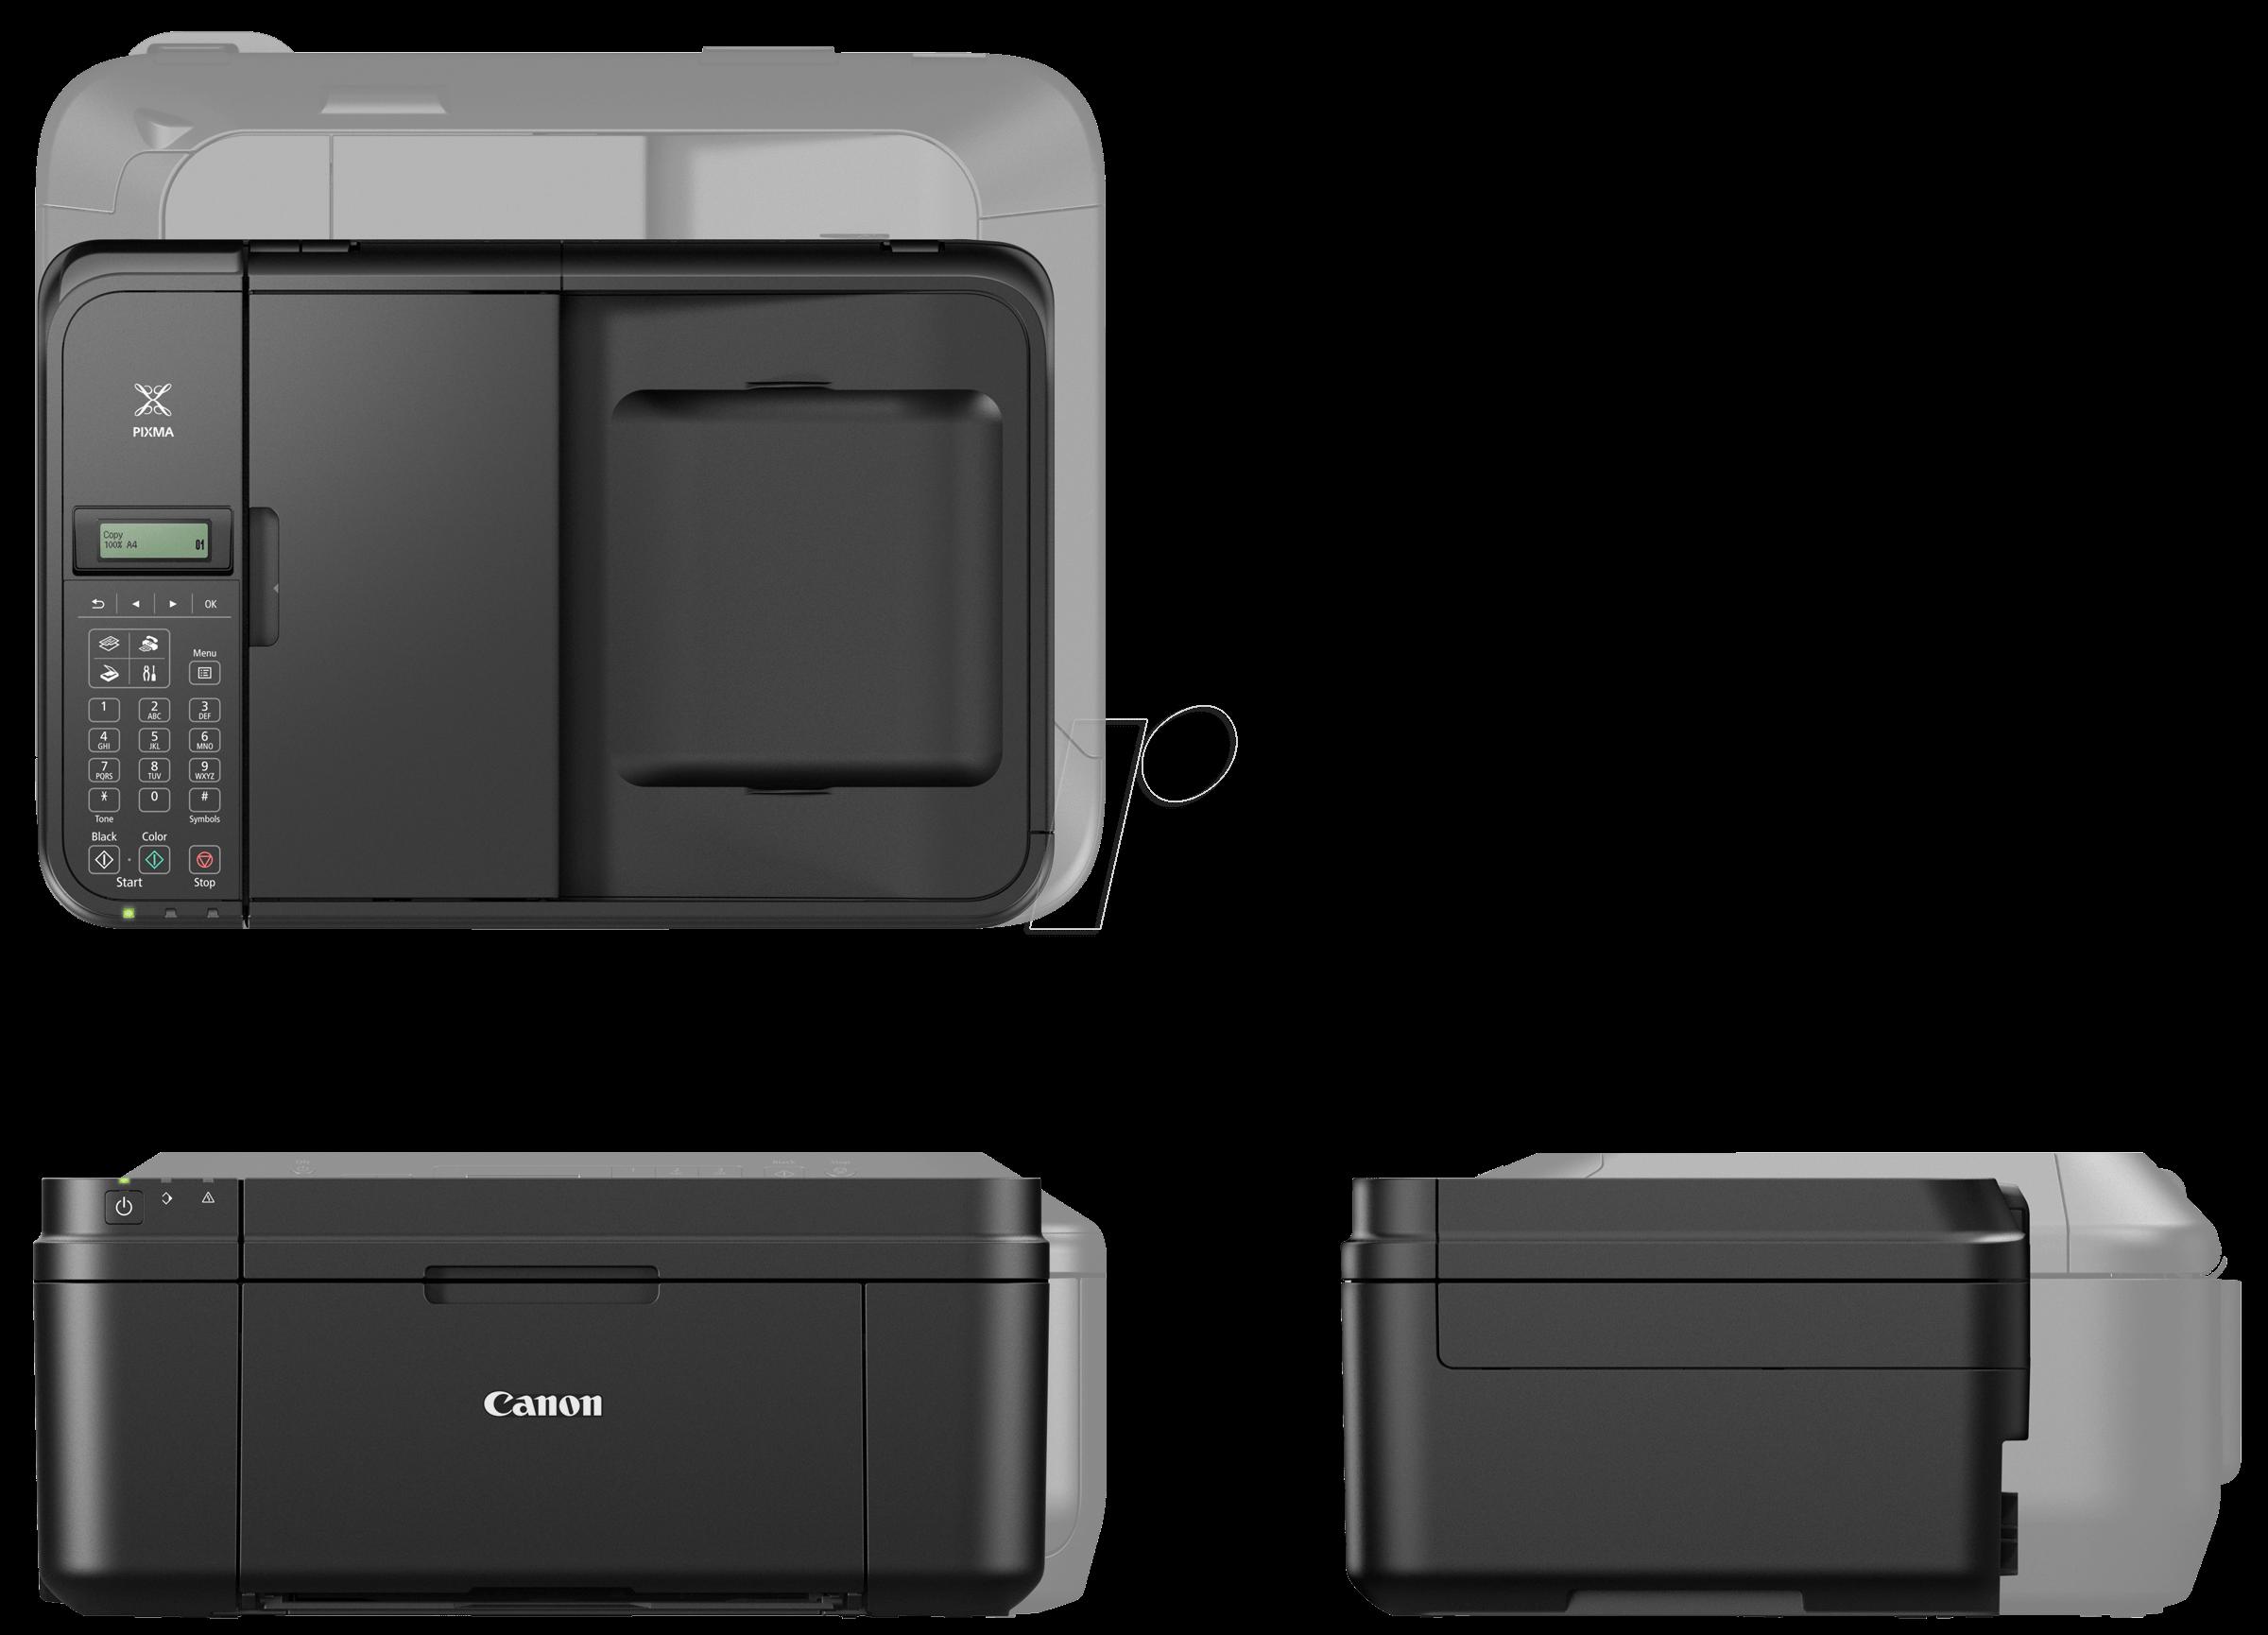 canon mx495 sw 4in1 multifunktionsdrucker mit wlan bei. Black Bedroom Furniture Sets. Home Design Ideas